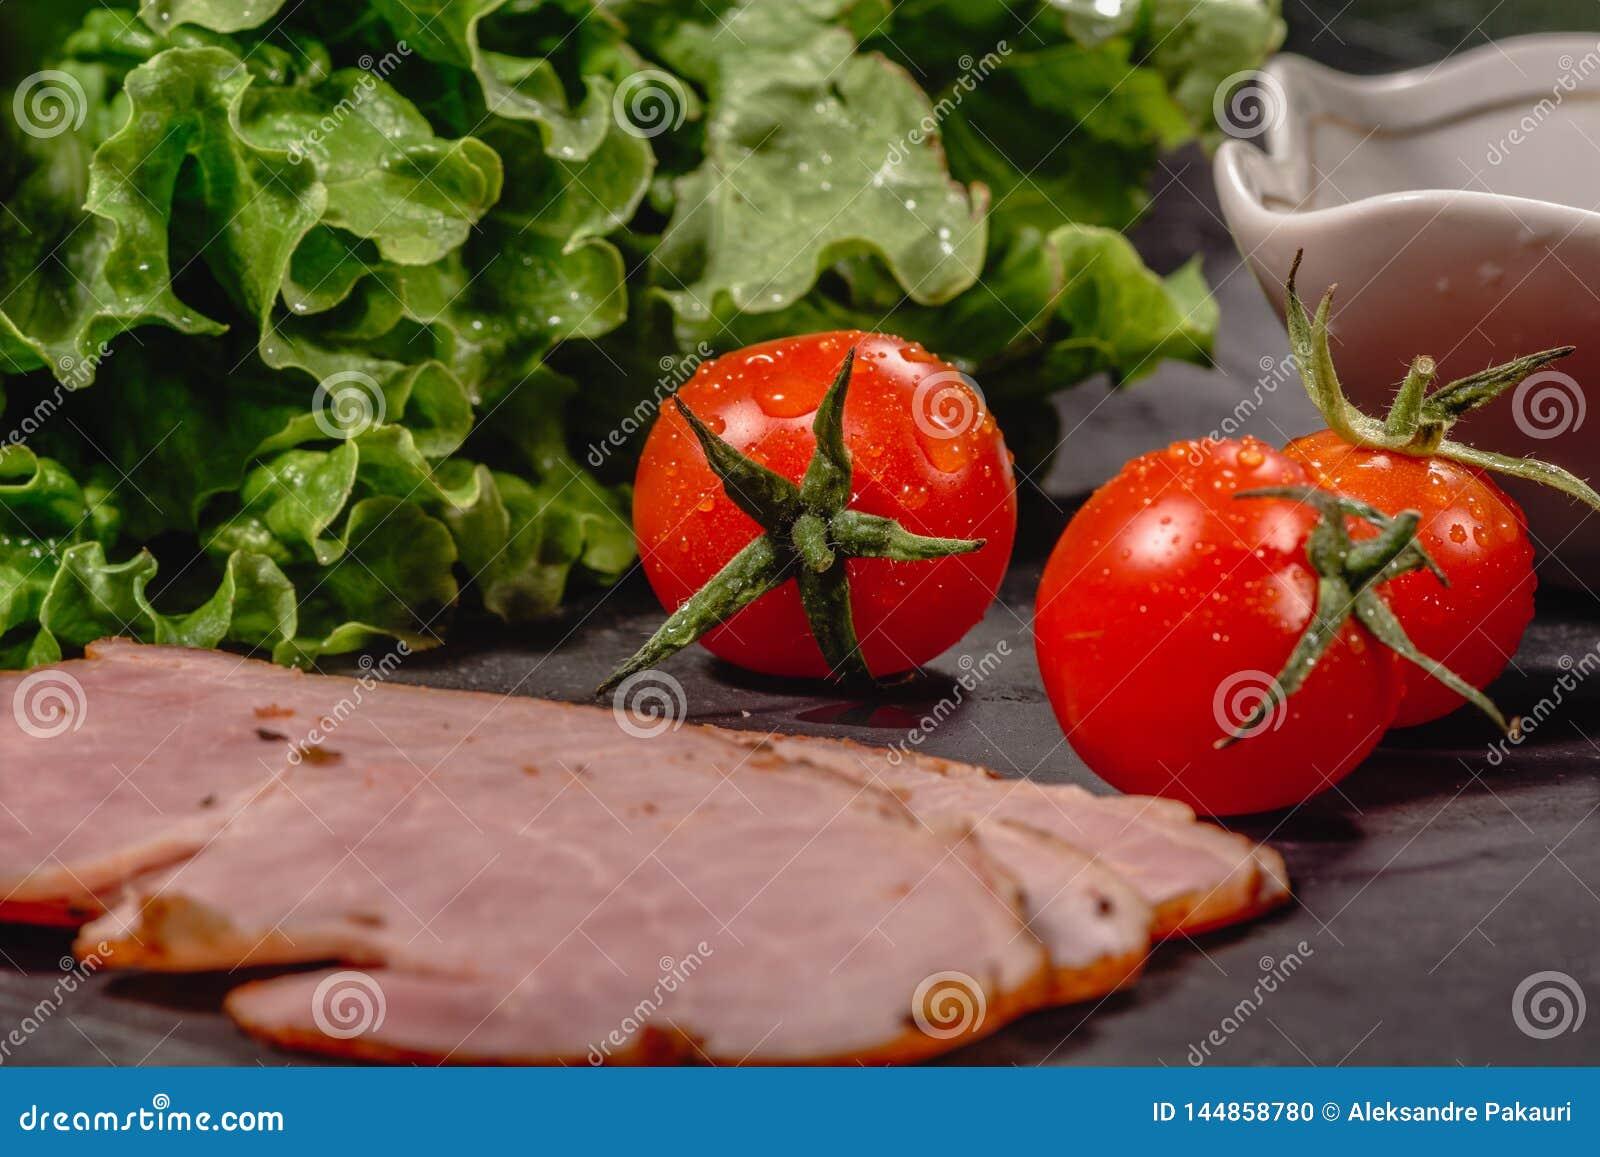 Ingredientes para cocinar bruschetta italiano en la tabla oscura Bruschetta italiano con los tomates de cereza, salsa de queso, h